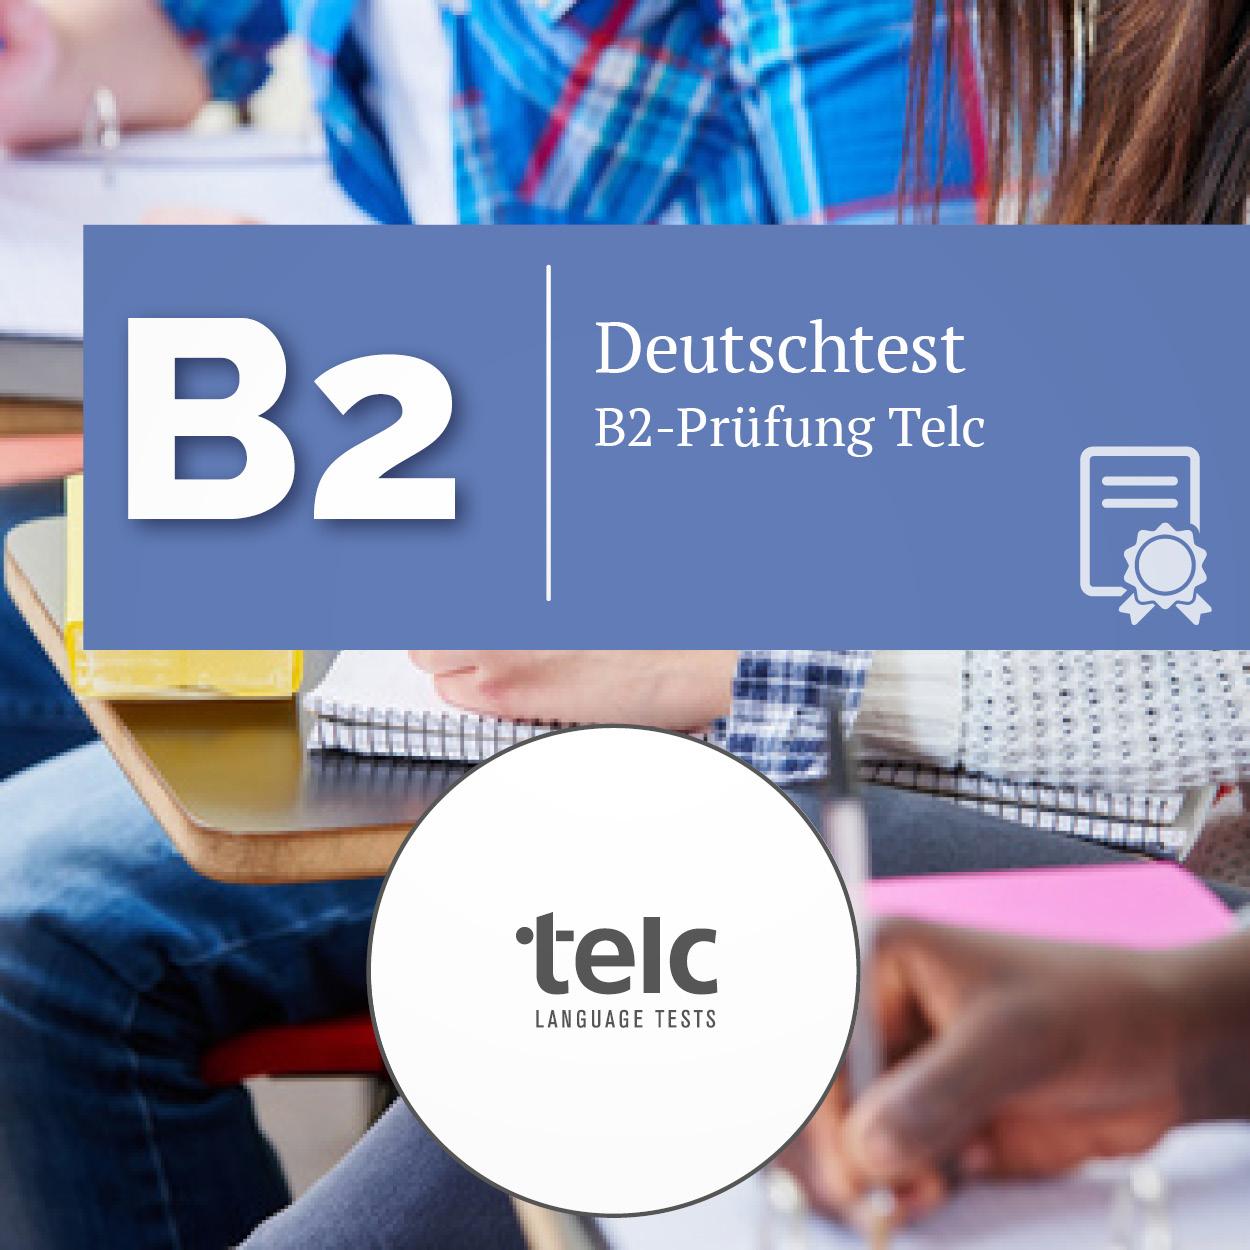 telc b2 prüfung termine 2020